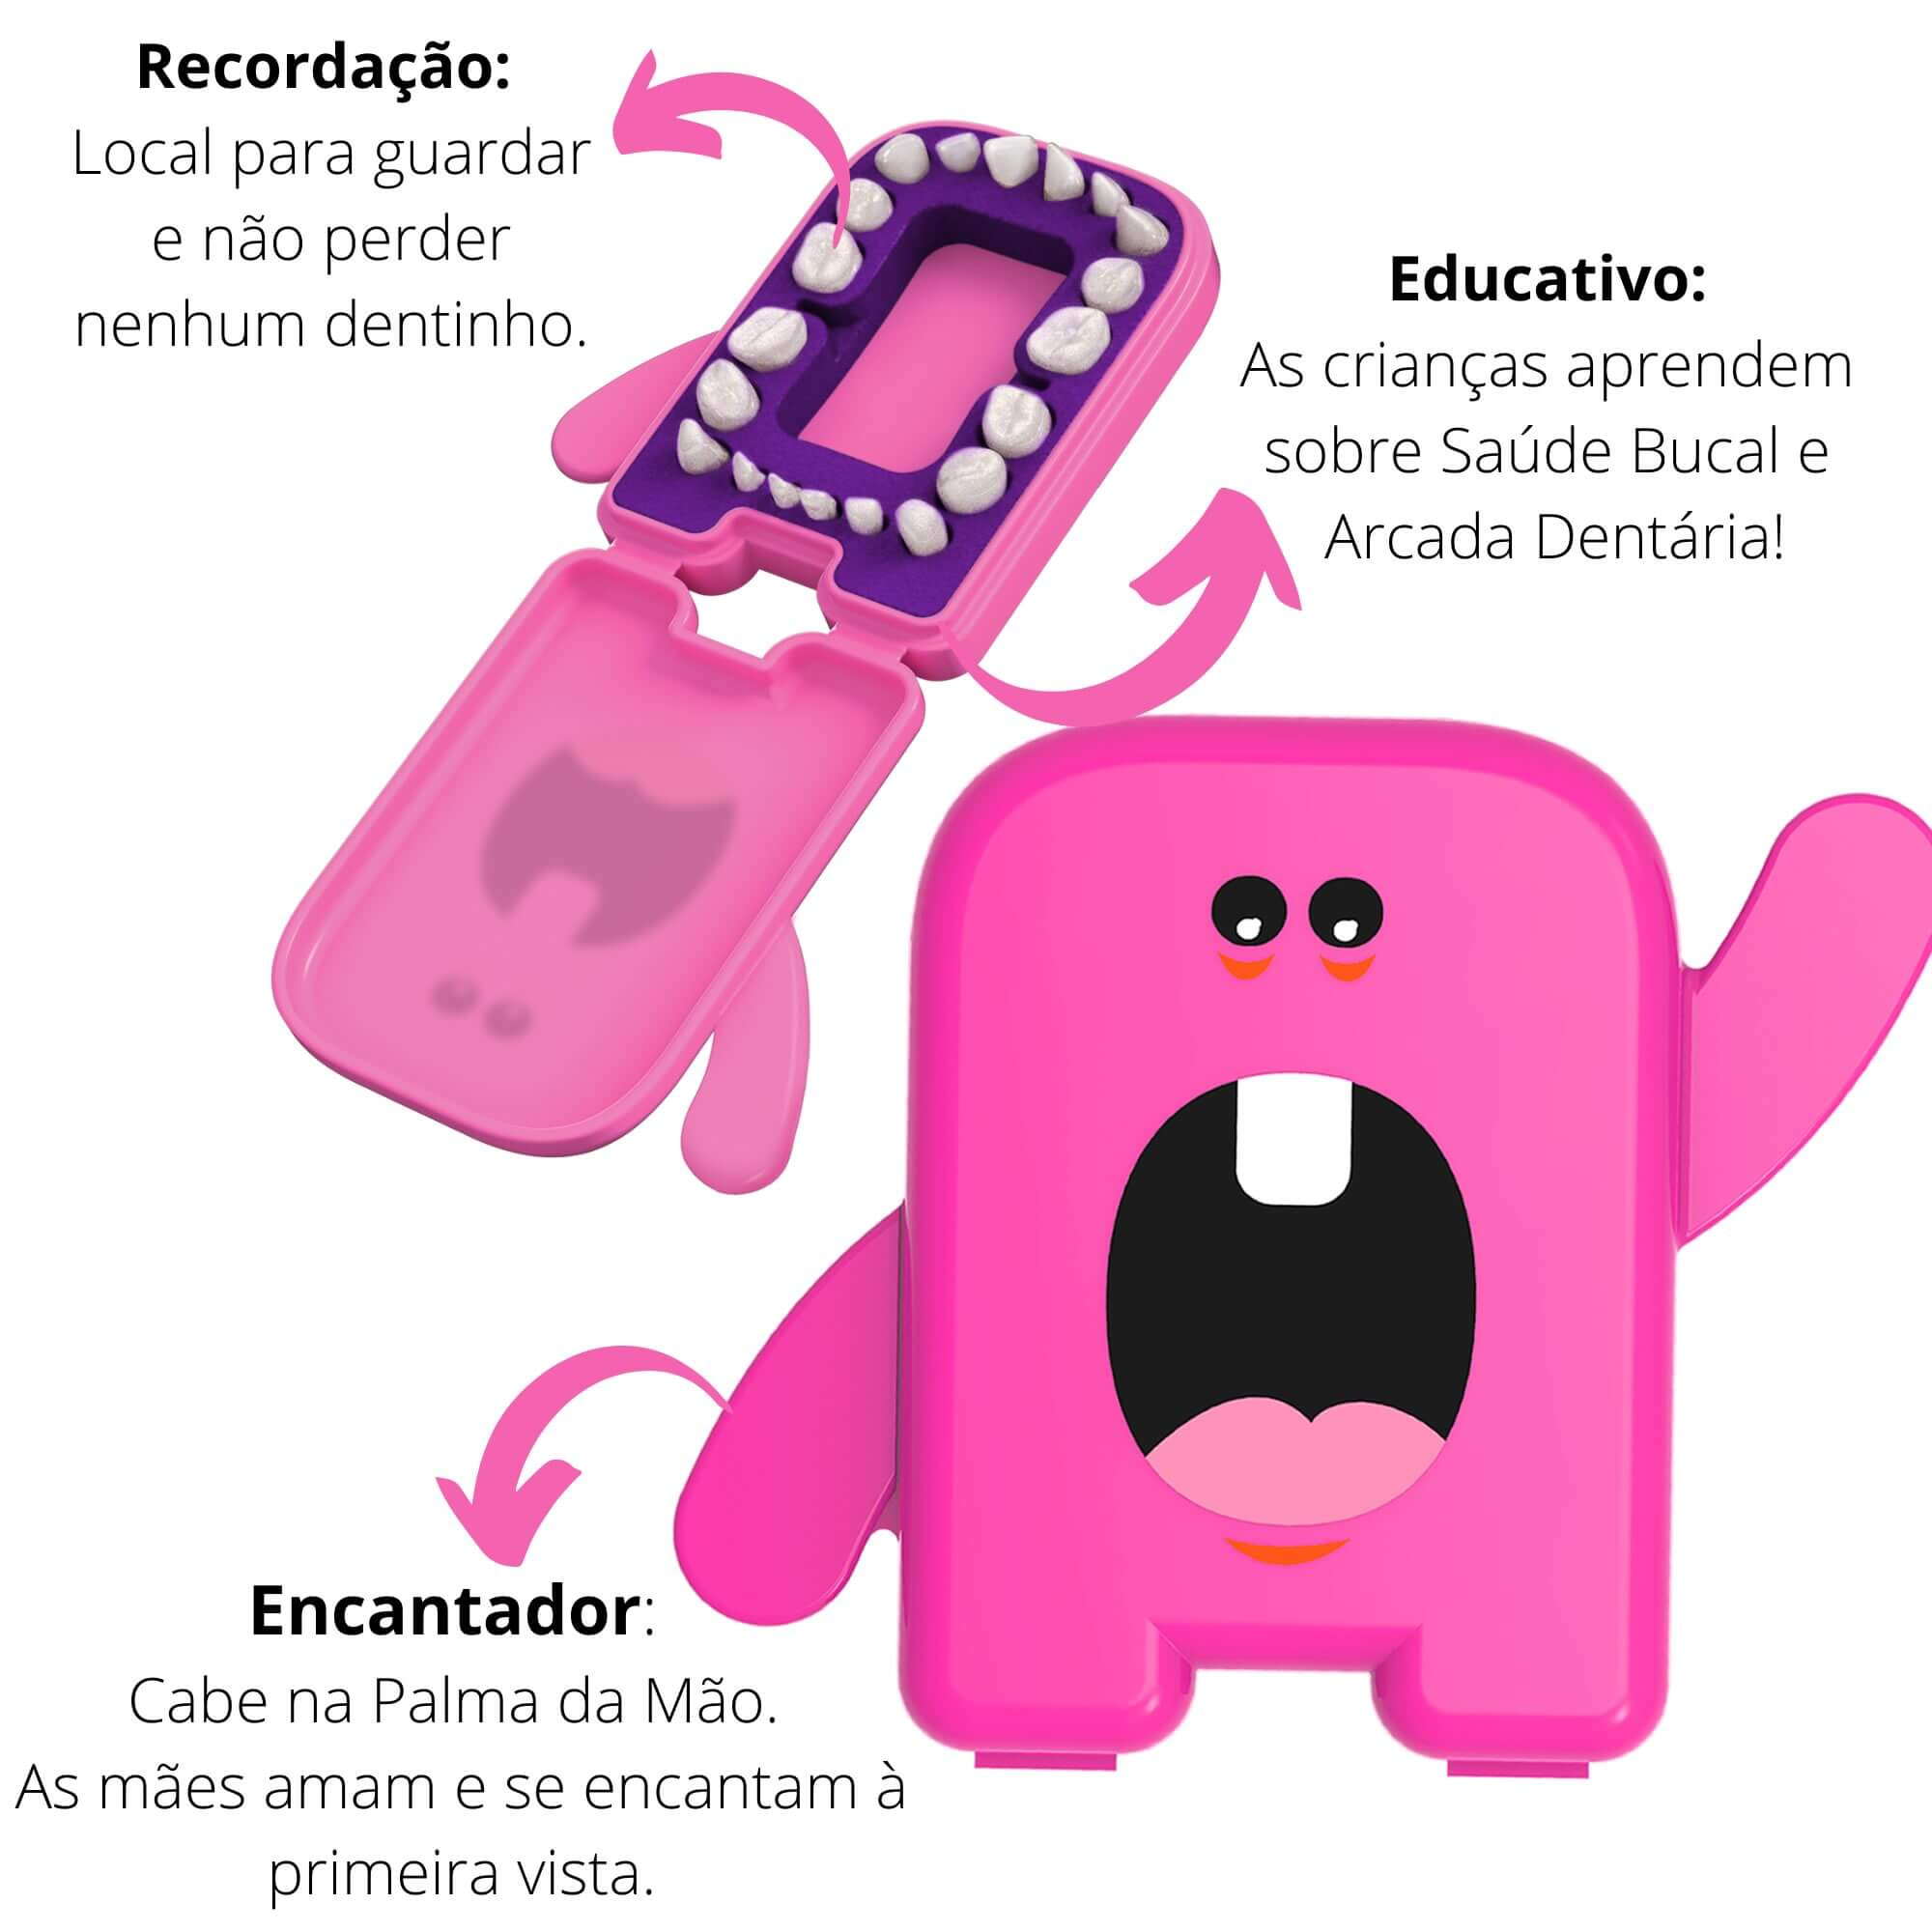 Kit Fada do Dente Rosa Angie by Angelus